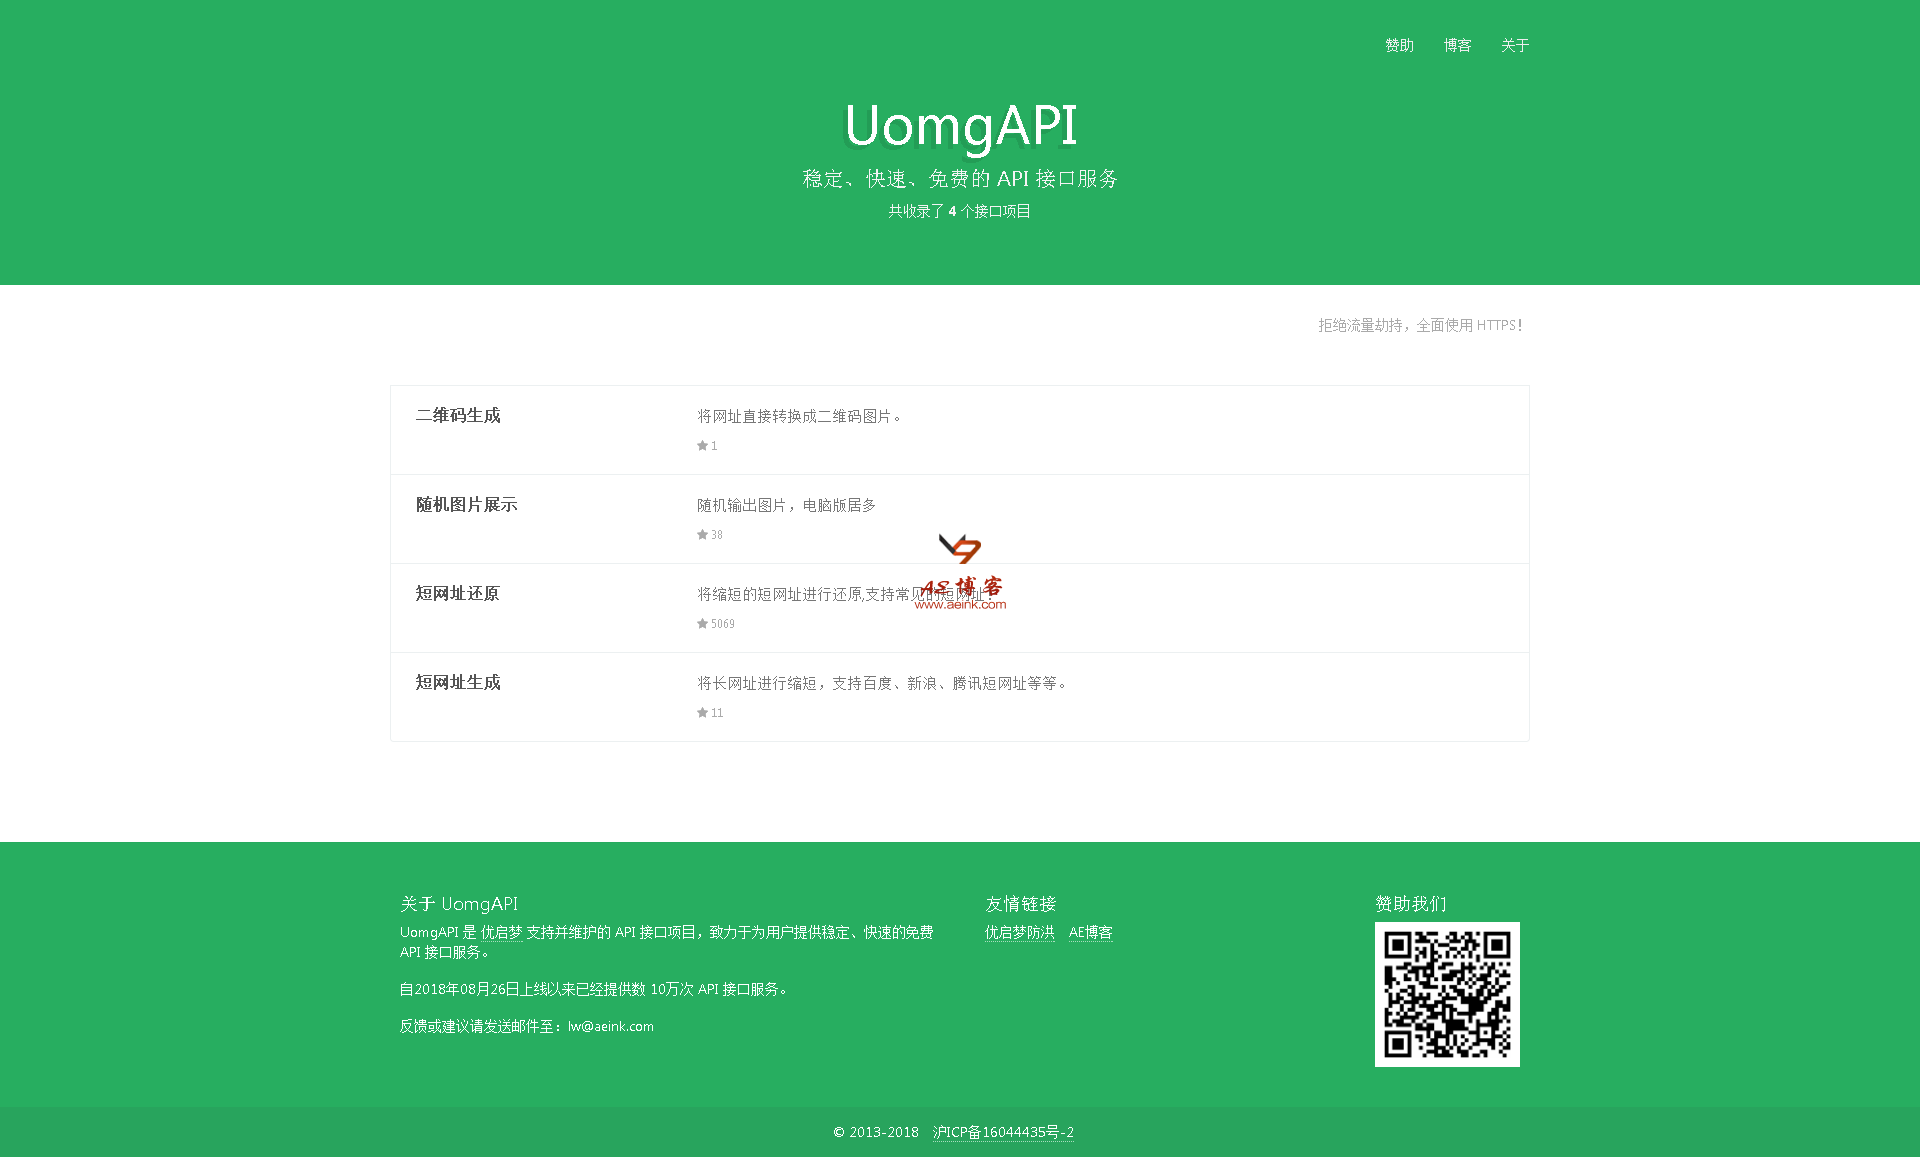 UomgAPI - 优启梦免费提供 API 接口查询服务.png